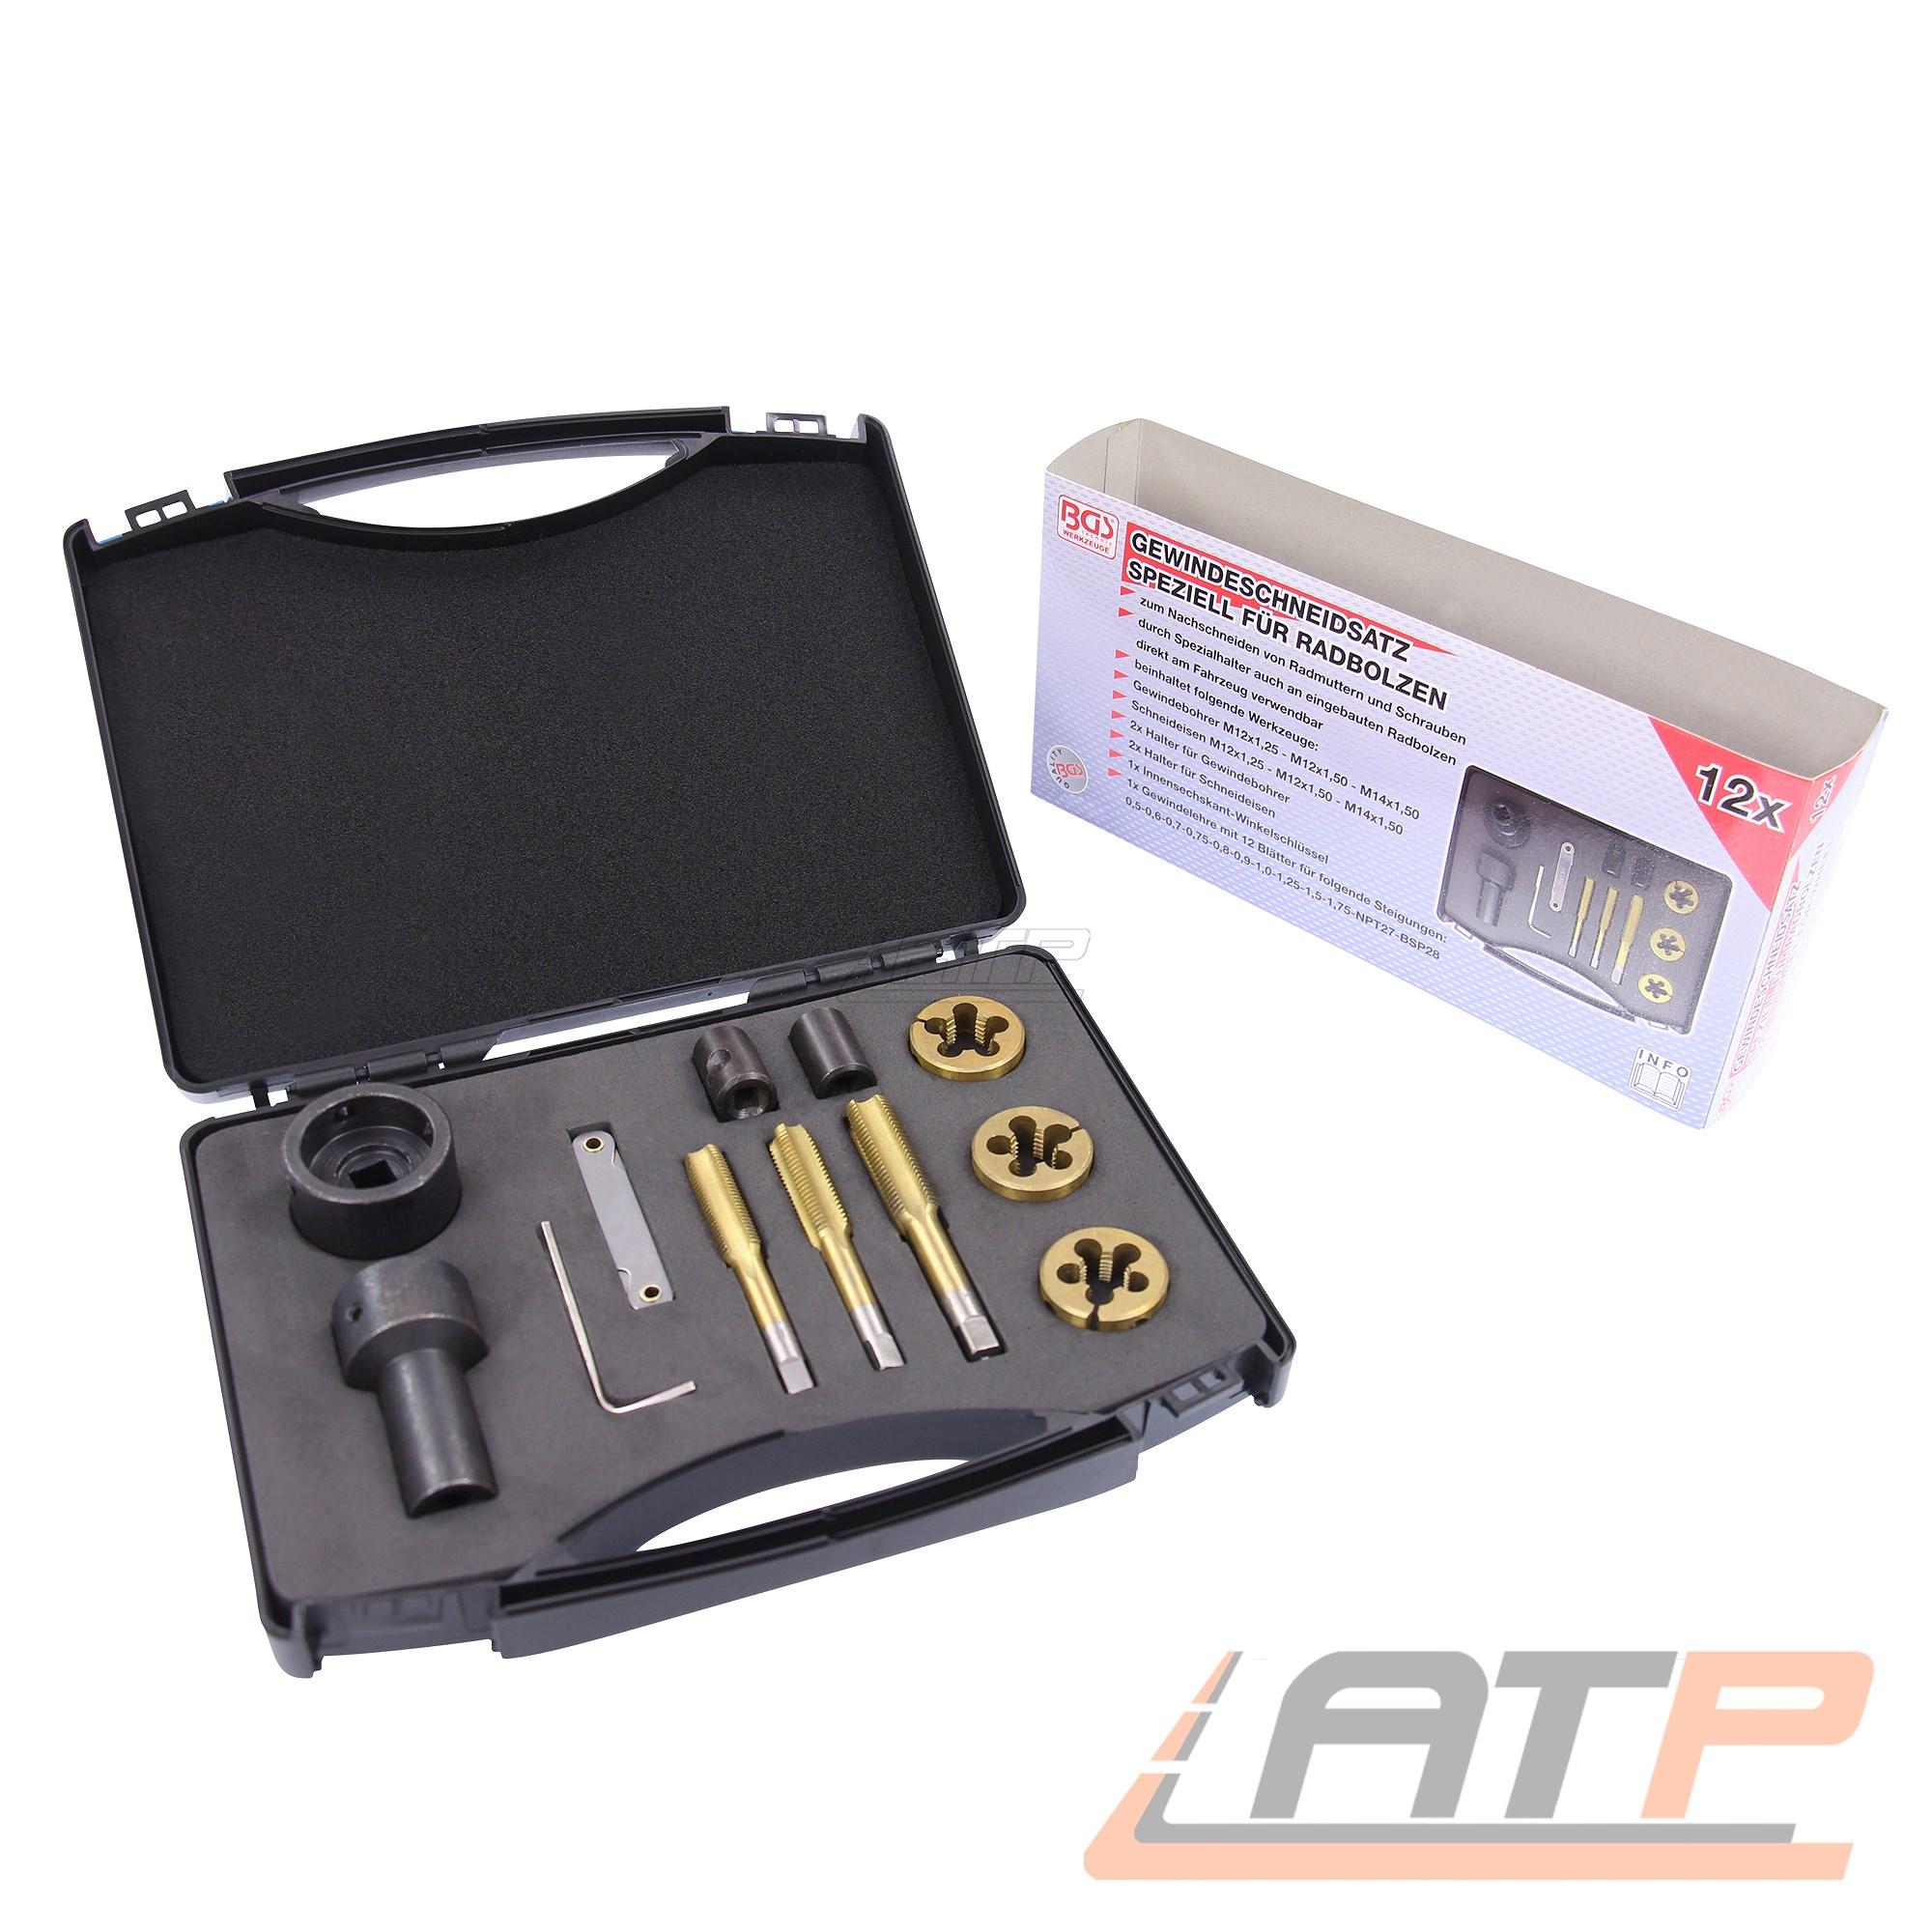 UPE0E471MNN6308 Aluminium Polymer Kondensator 470uF 2,5V 6,3x8mm  #BP 10 pcs